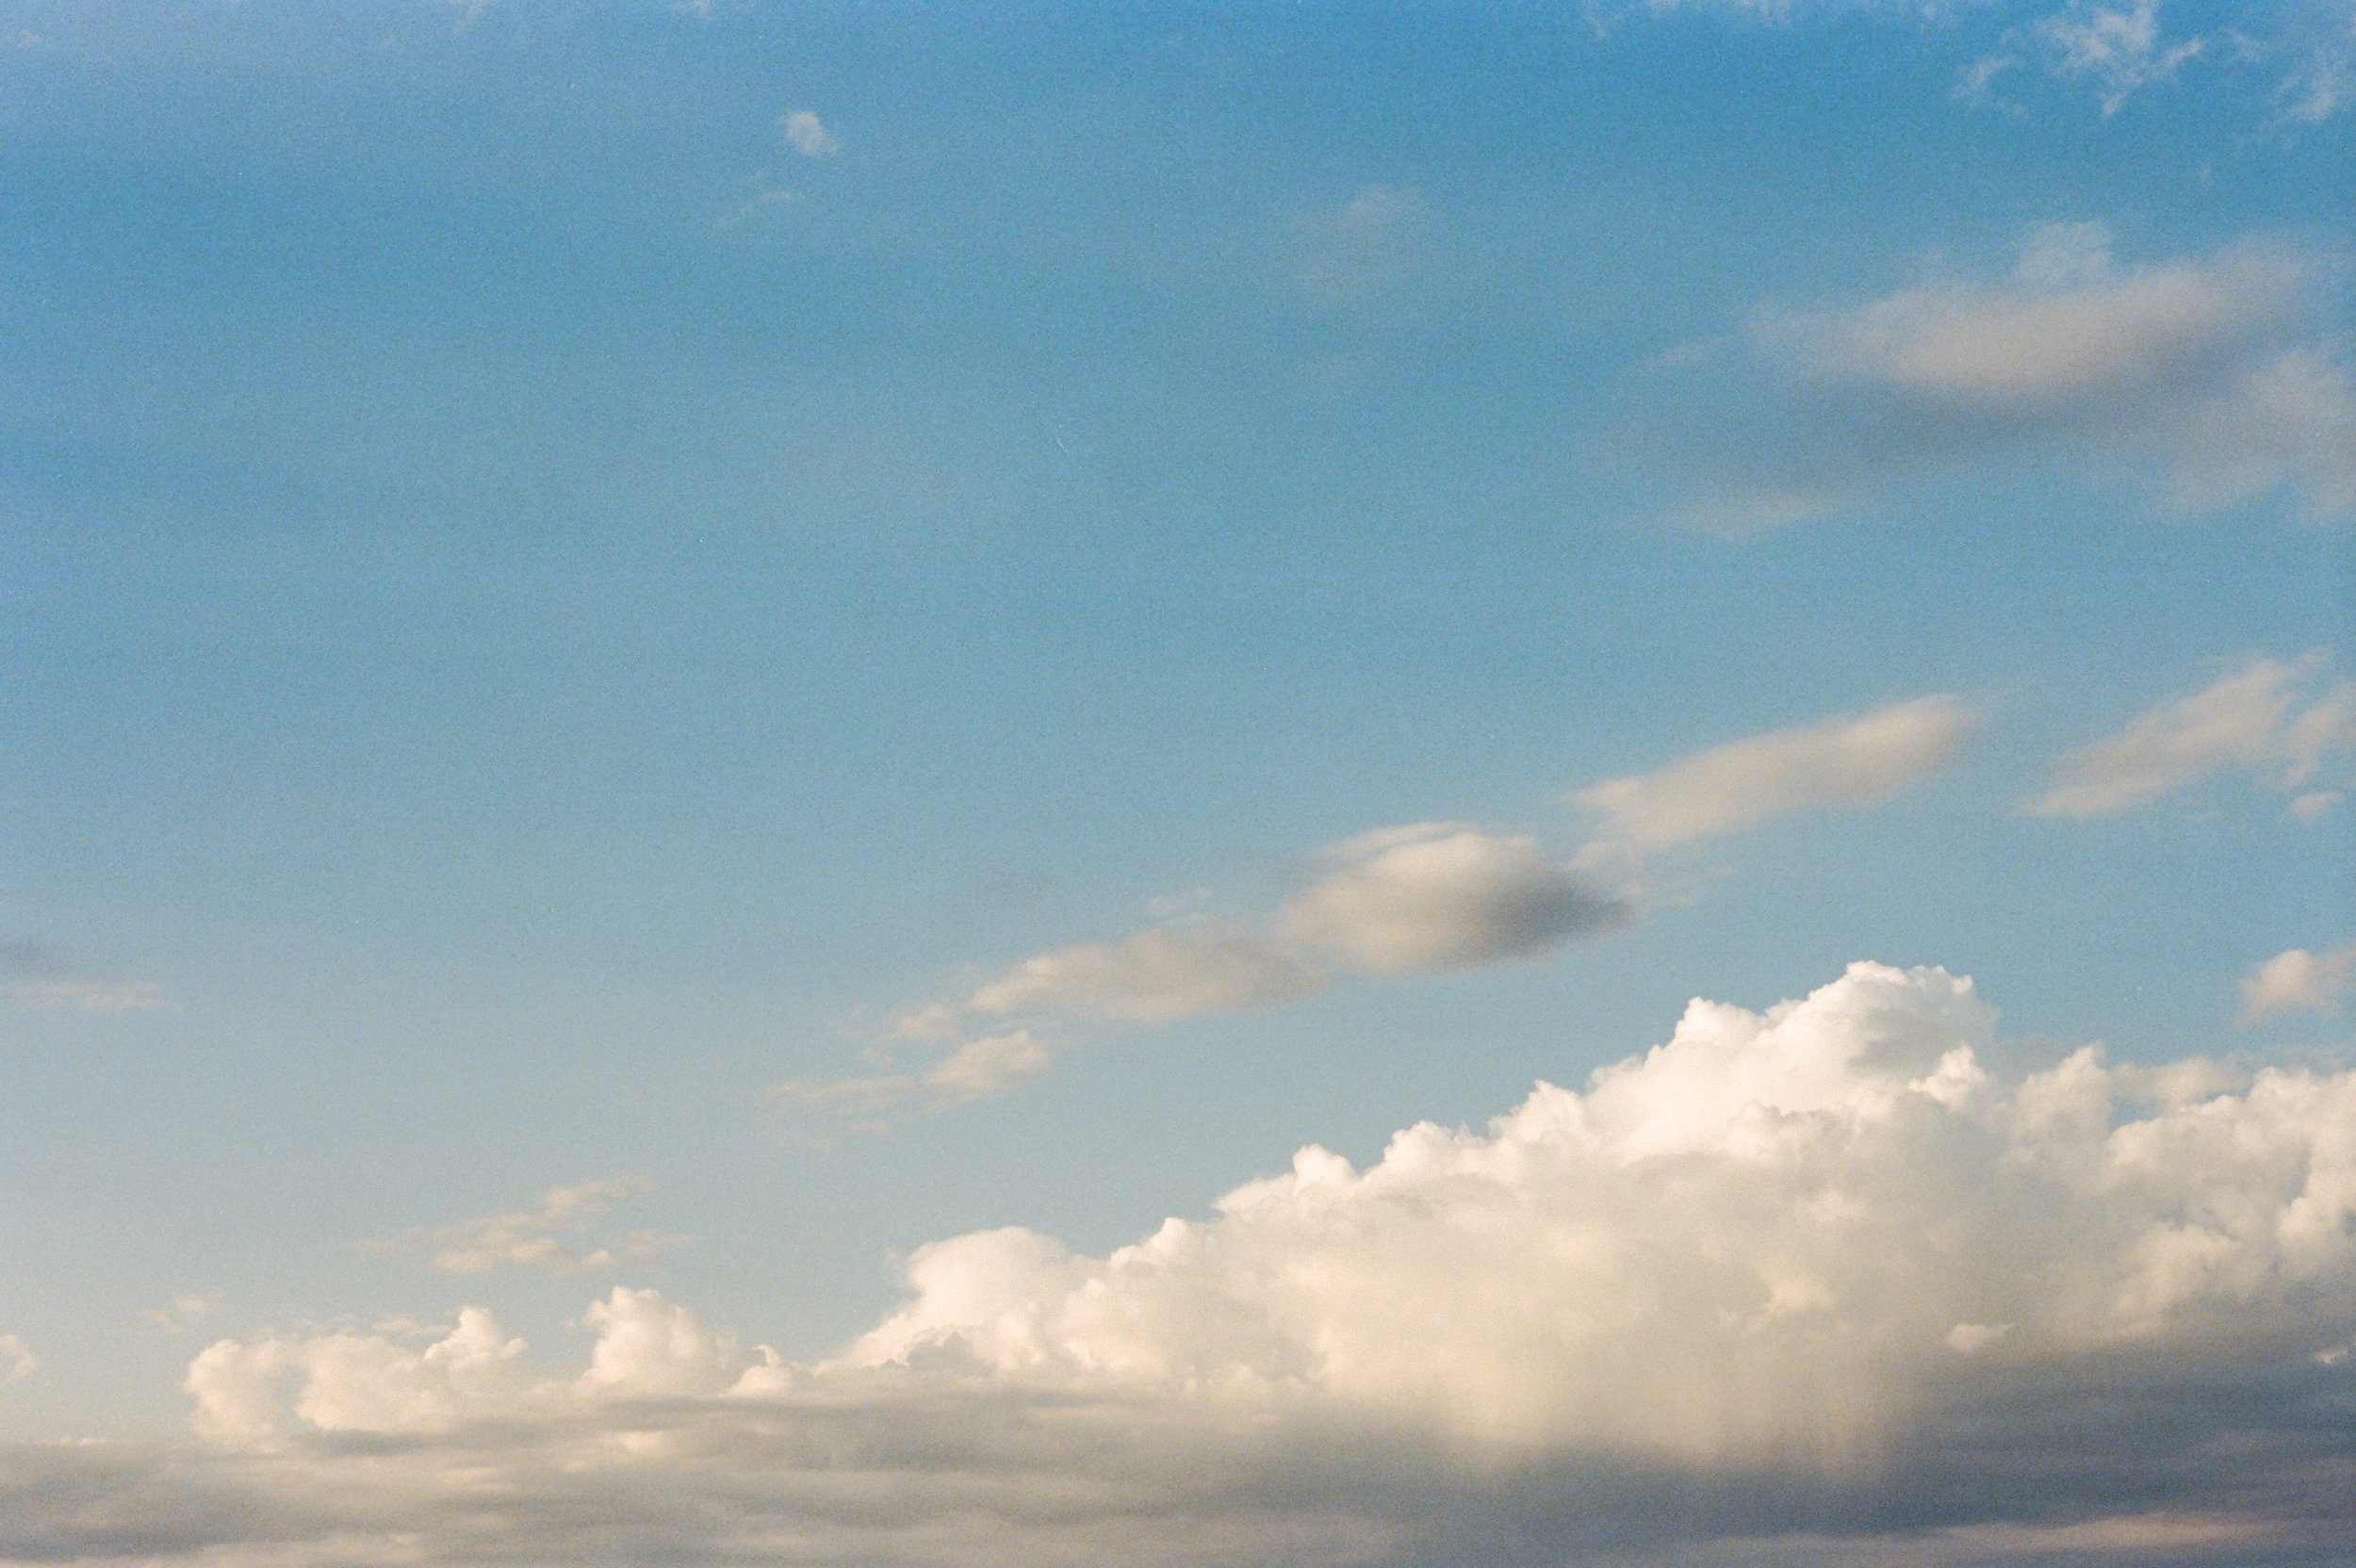 clouds_cloud_film_photographer_emily_walker_4.jpg